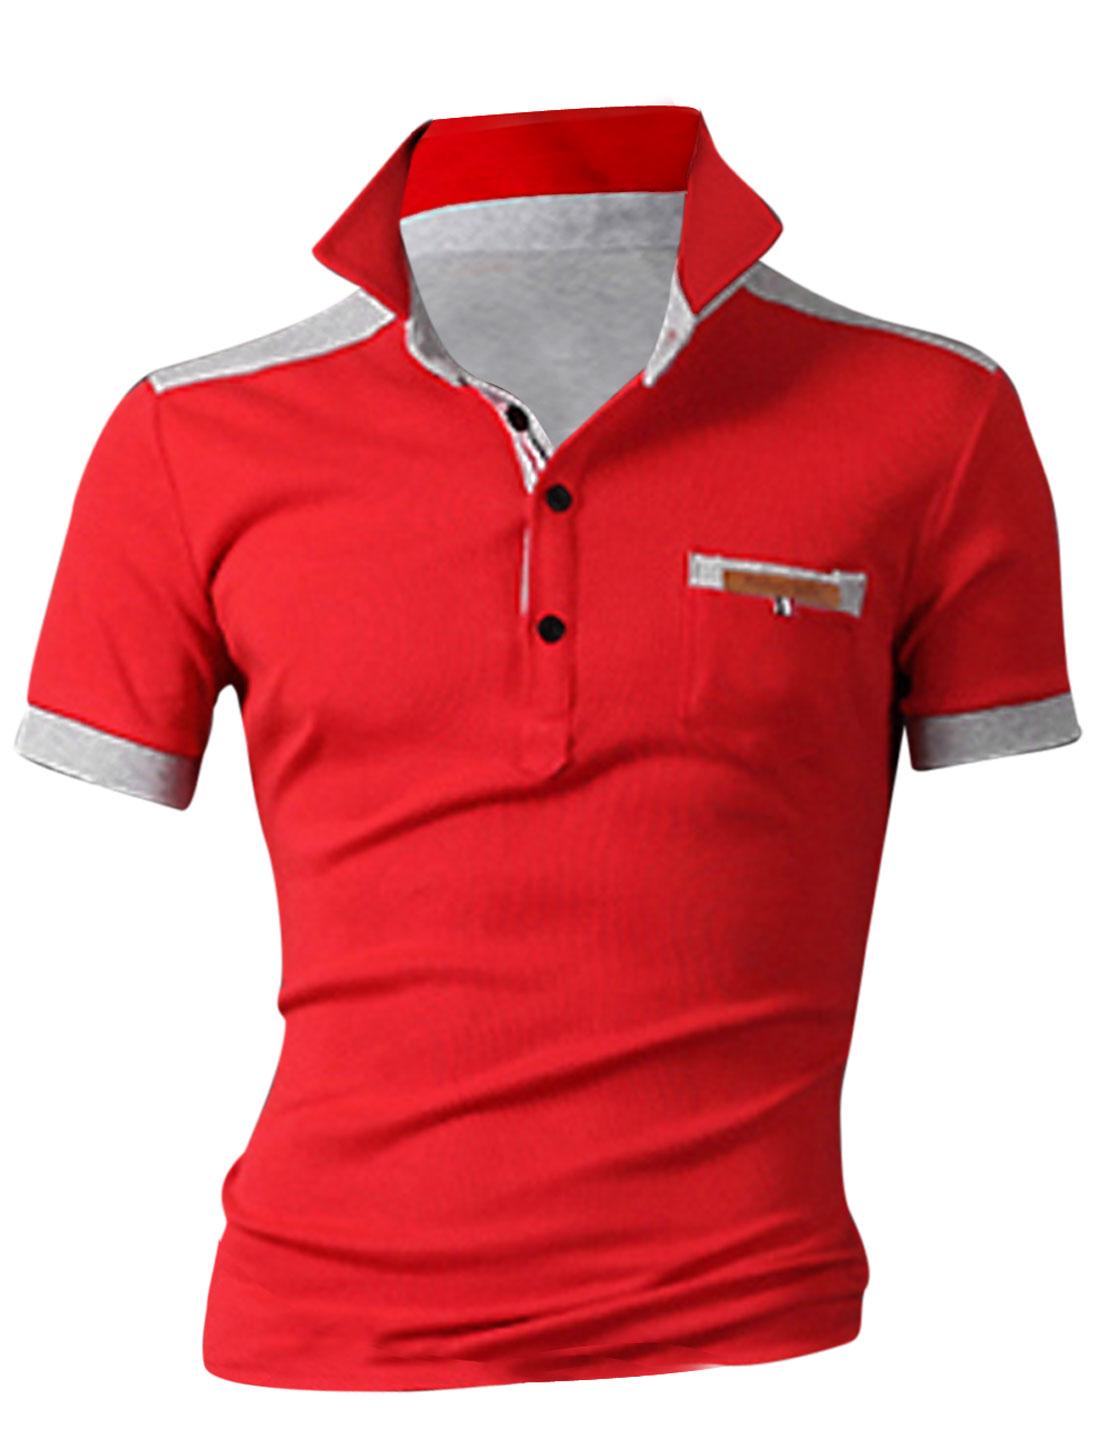 Men Convertible Collar Short Sleeve Colorblock Polo Shirt Red M